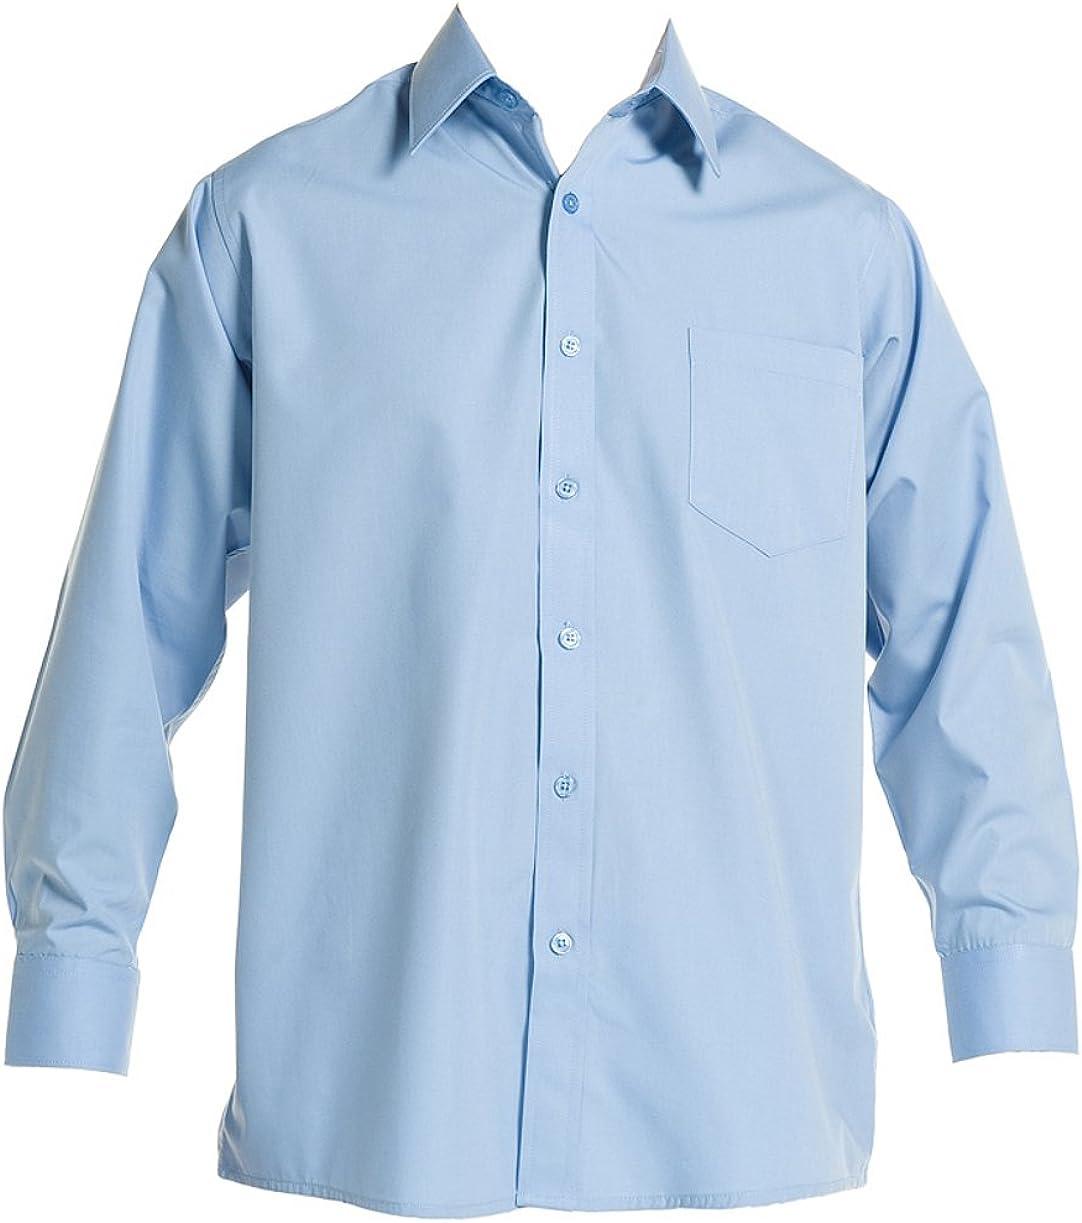 Preferred School Uniform Boy's Long Sleeve Shirt